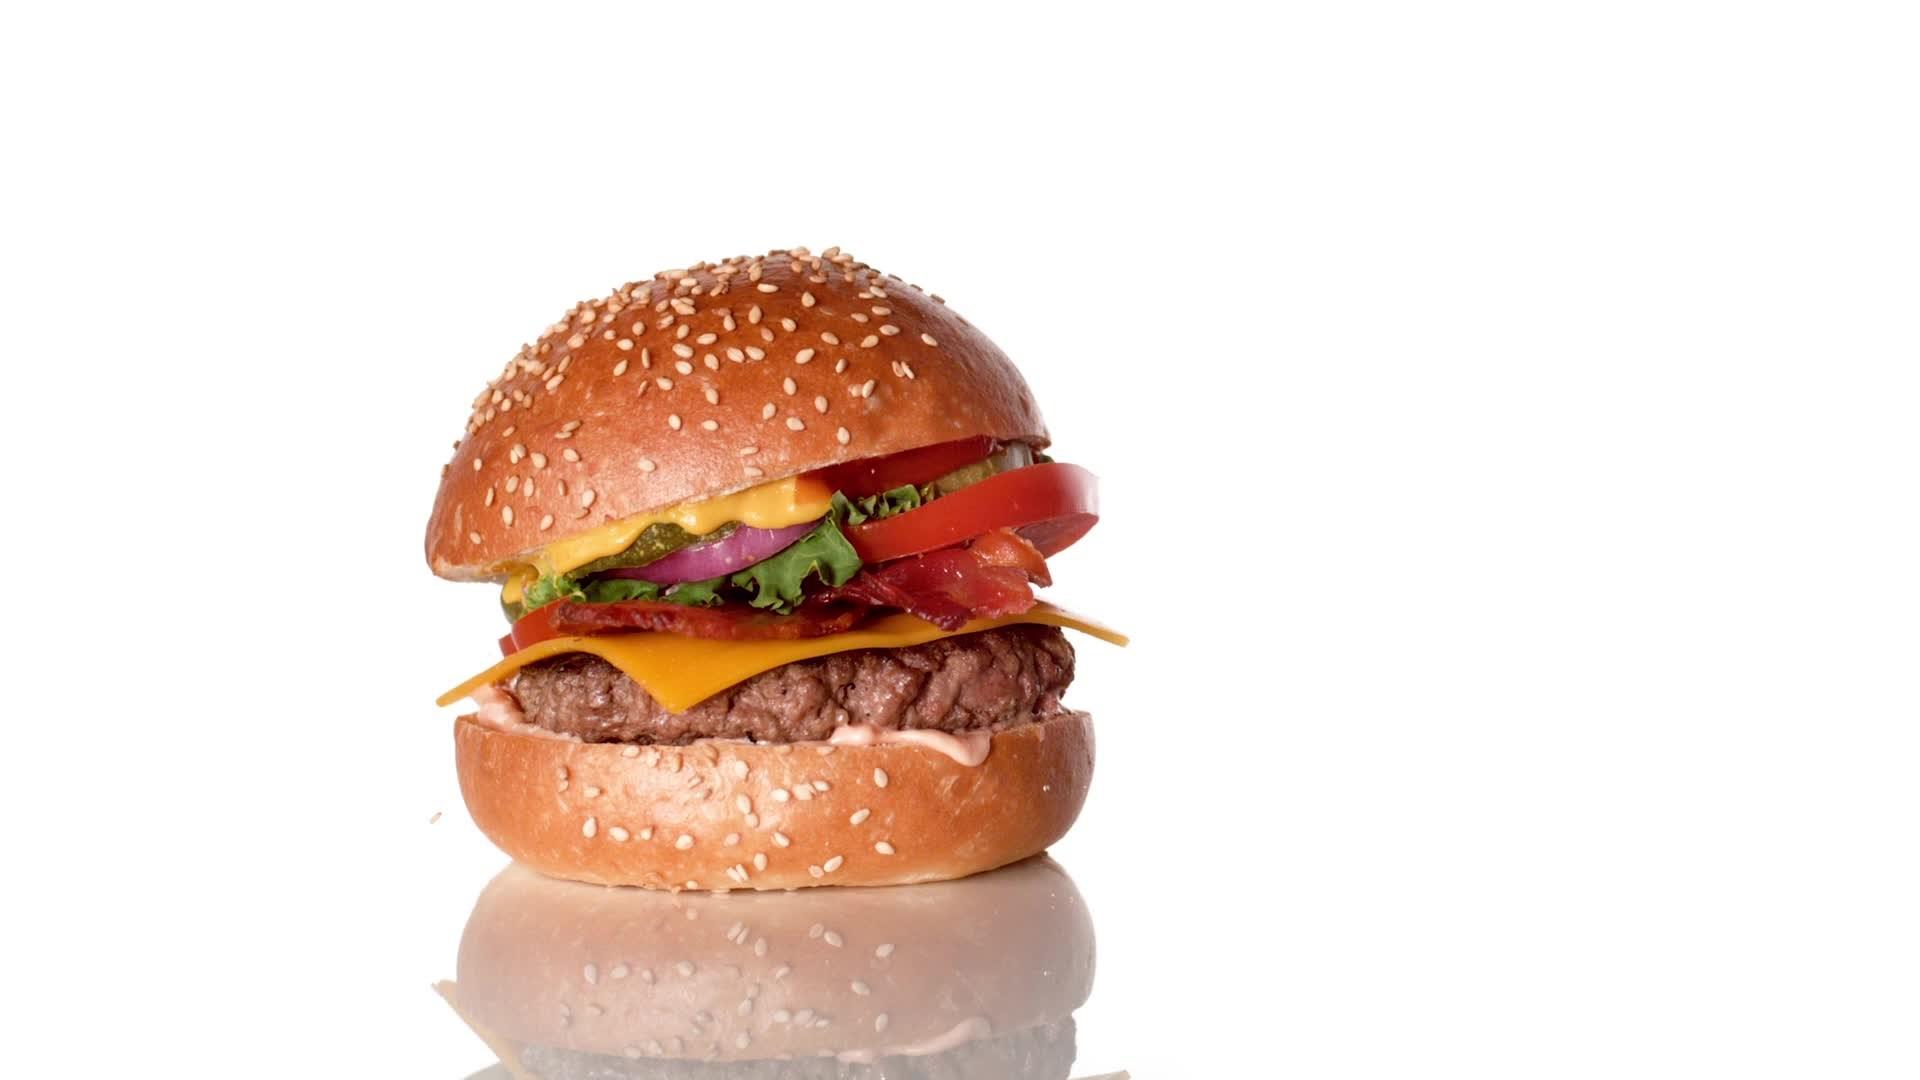 Behind The Scenes Burger